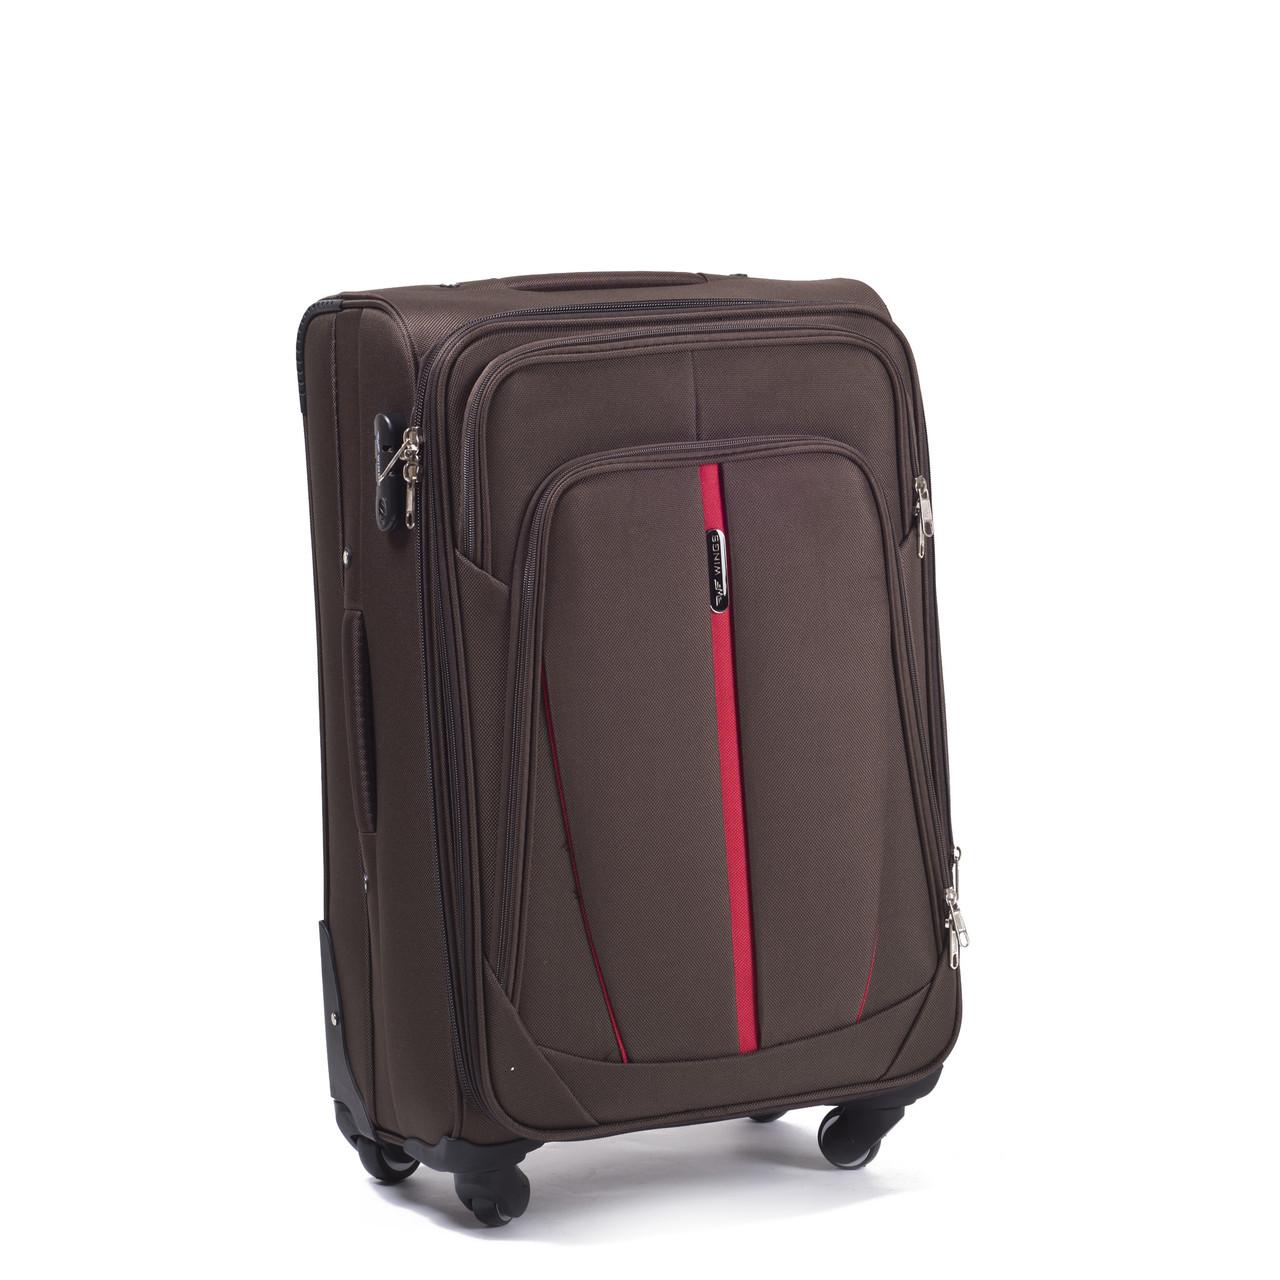 Средний тканевый чемодан Wings 1706 на 4 колесах коричневый